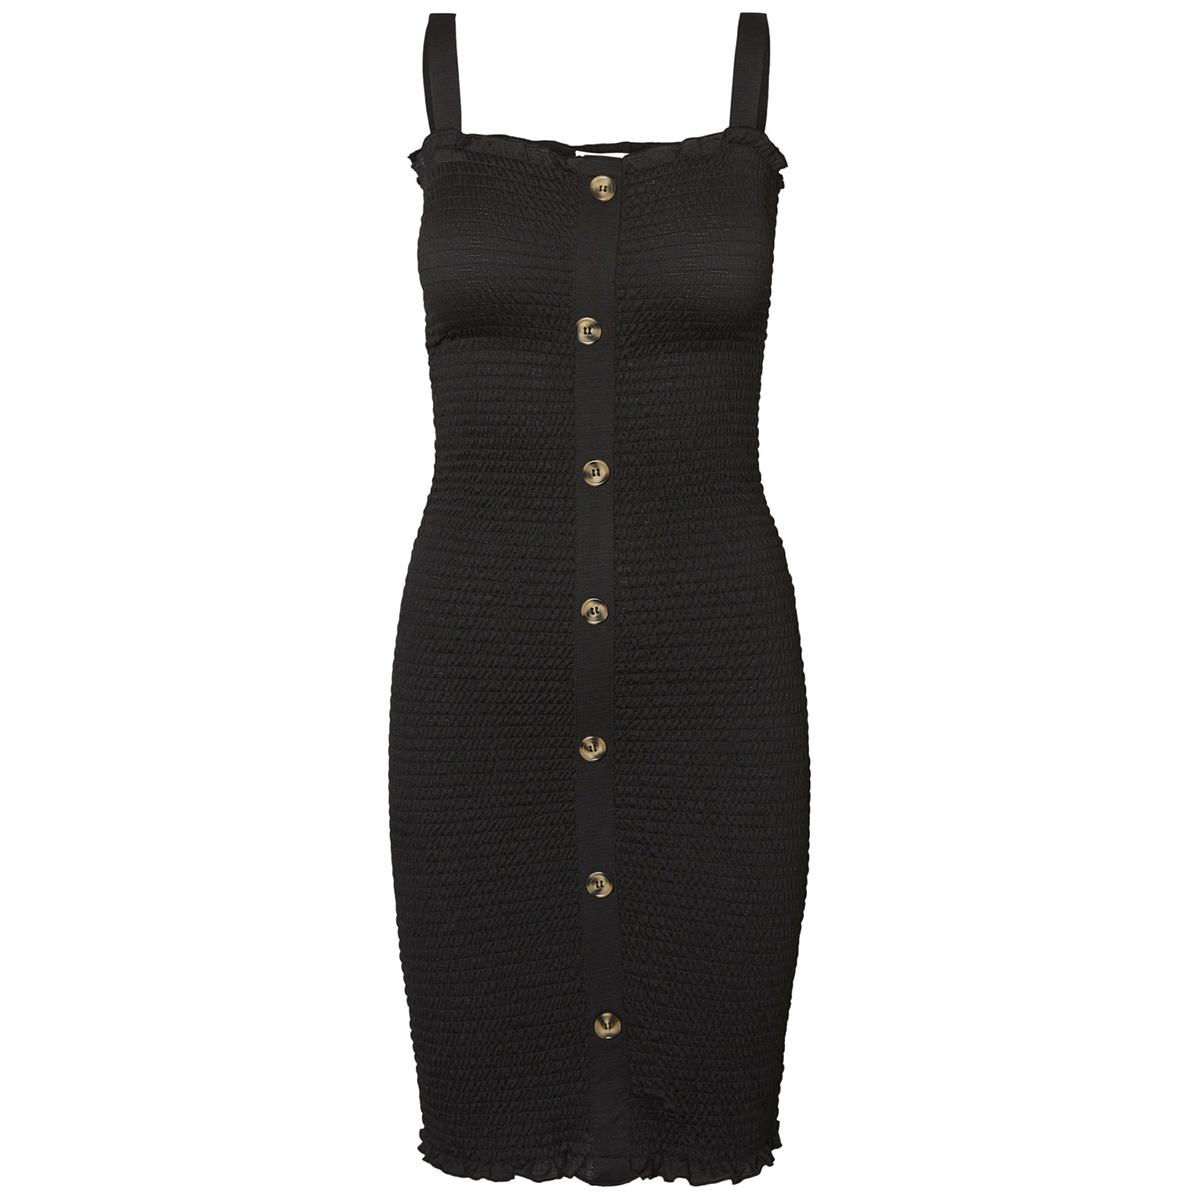 nmlea s/l smock dress 4h 27007086 noisy may jurk black